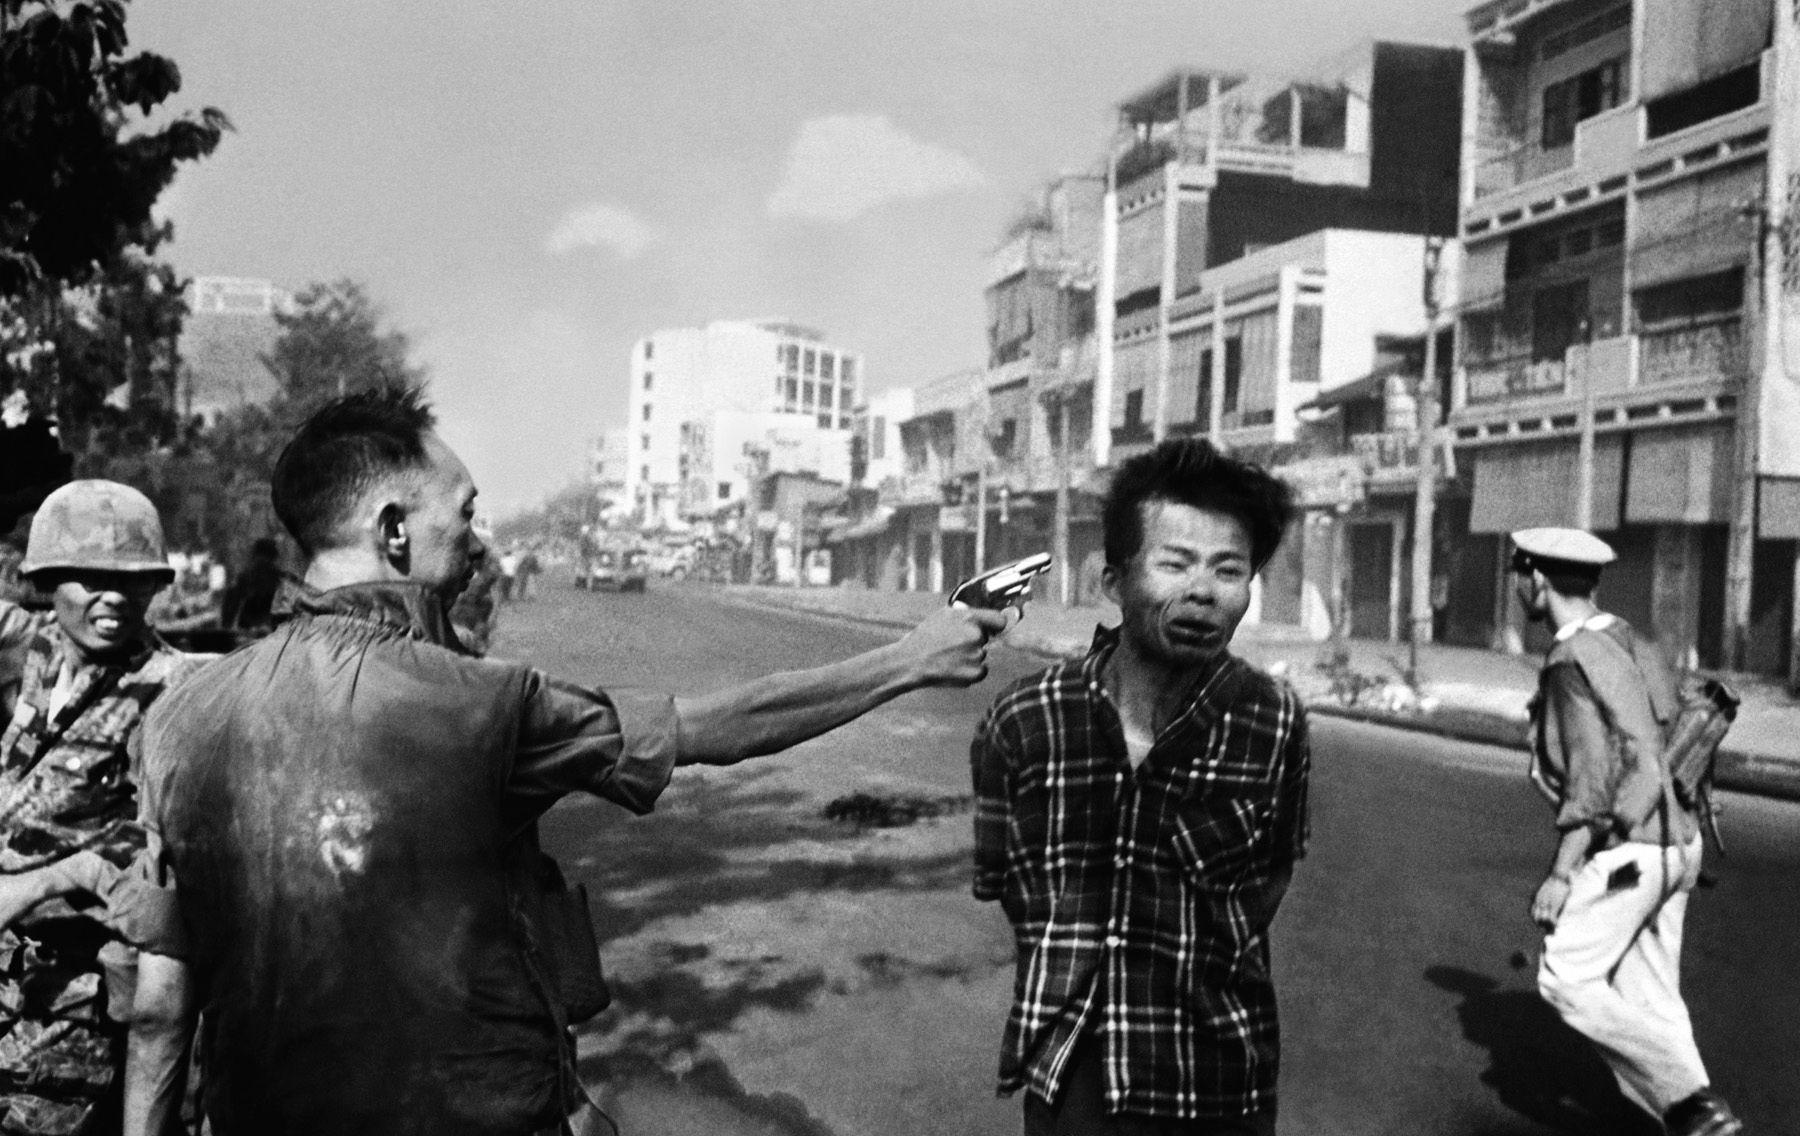 2. General Nguyen Ngoc Loan Executing a VietCong Prisoner in Saigon - Eddie Adams